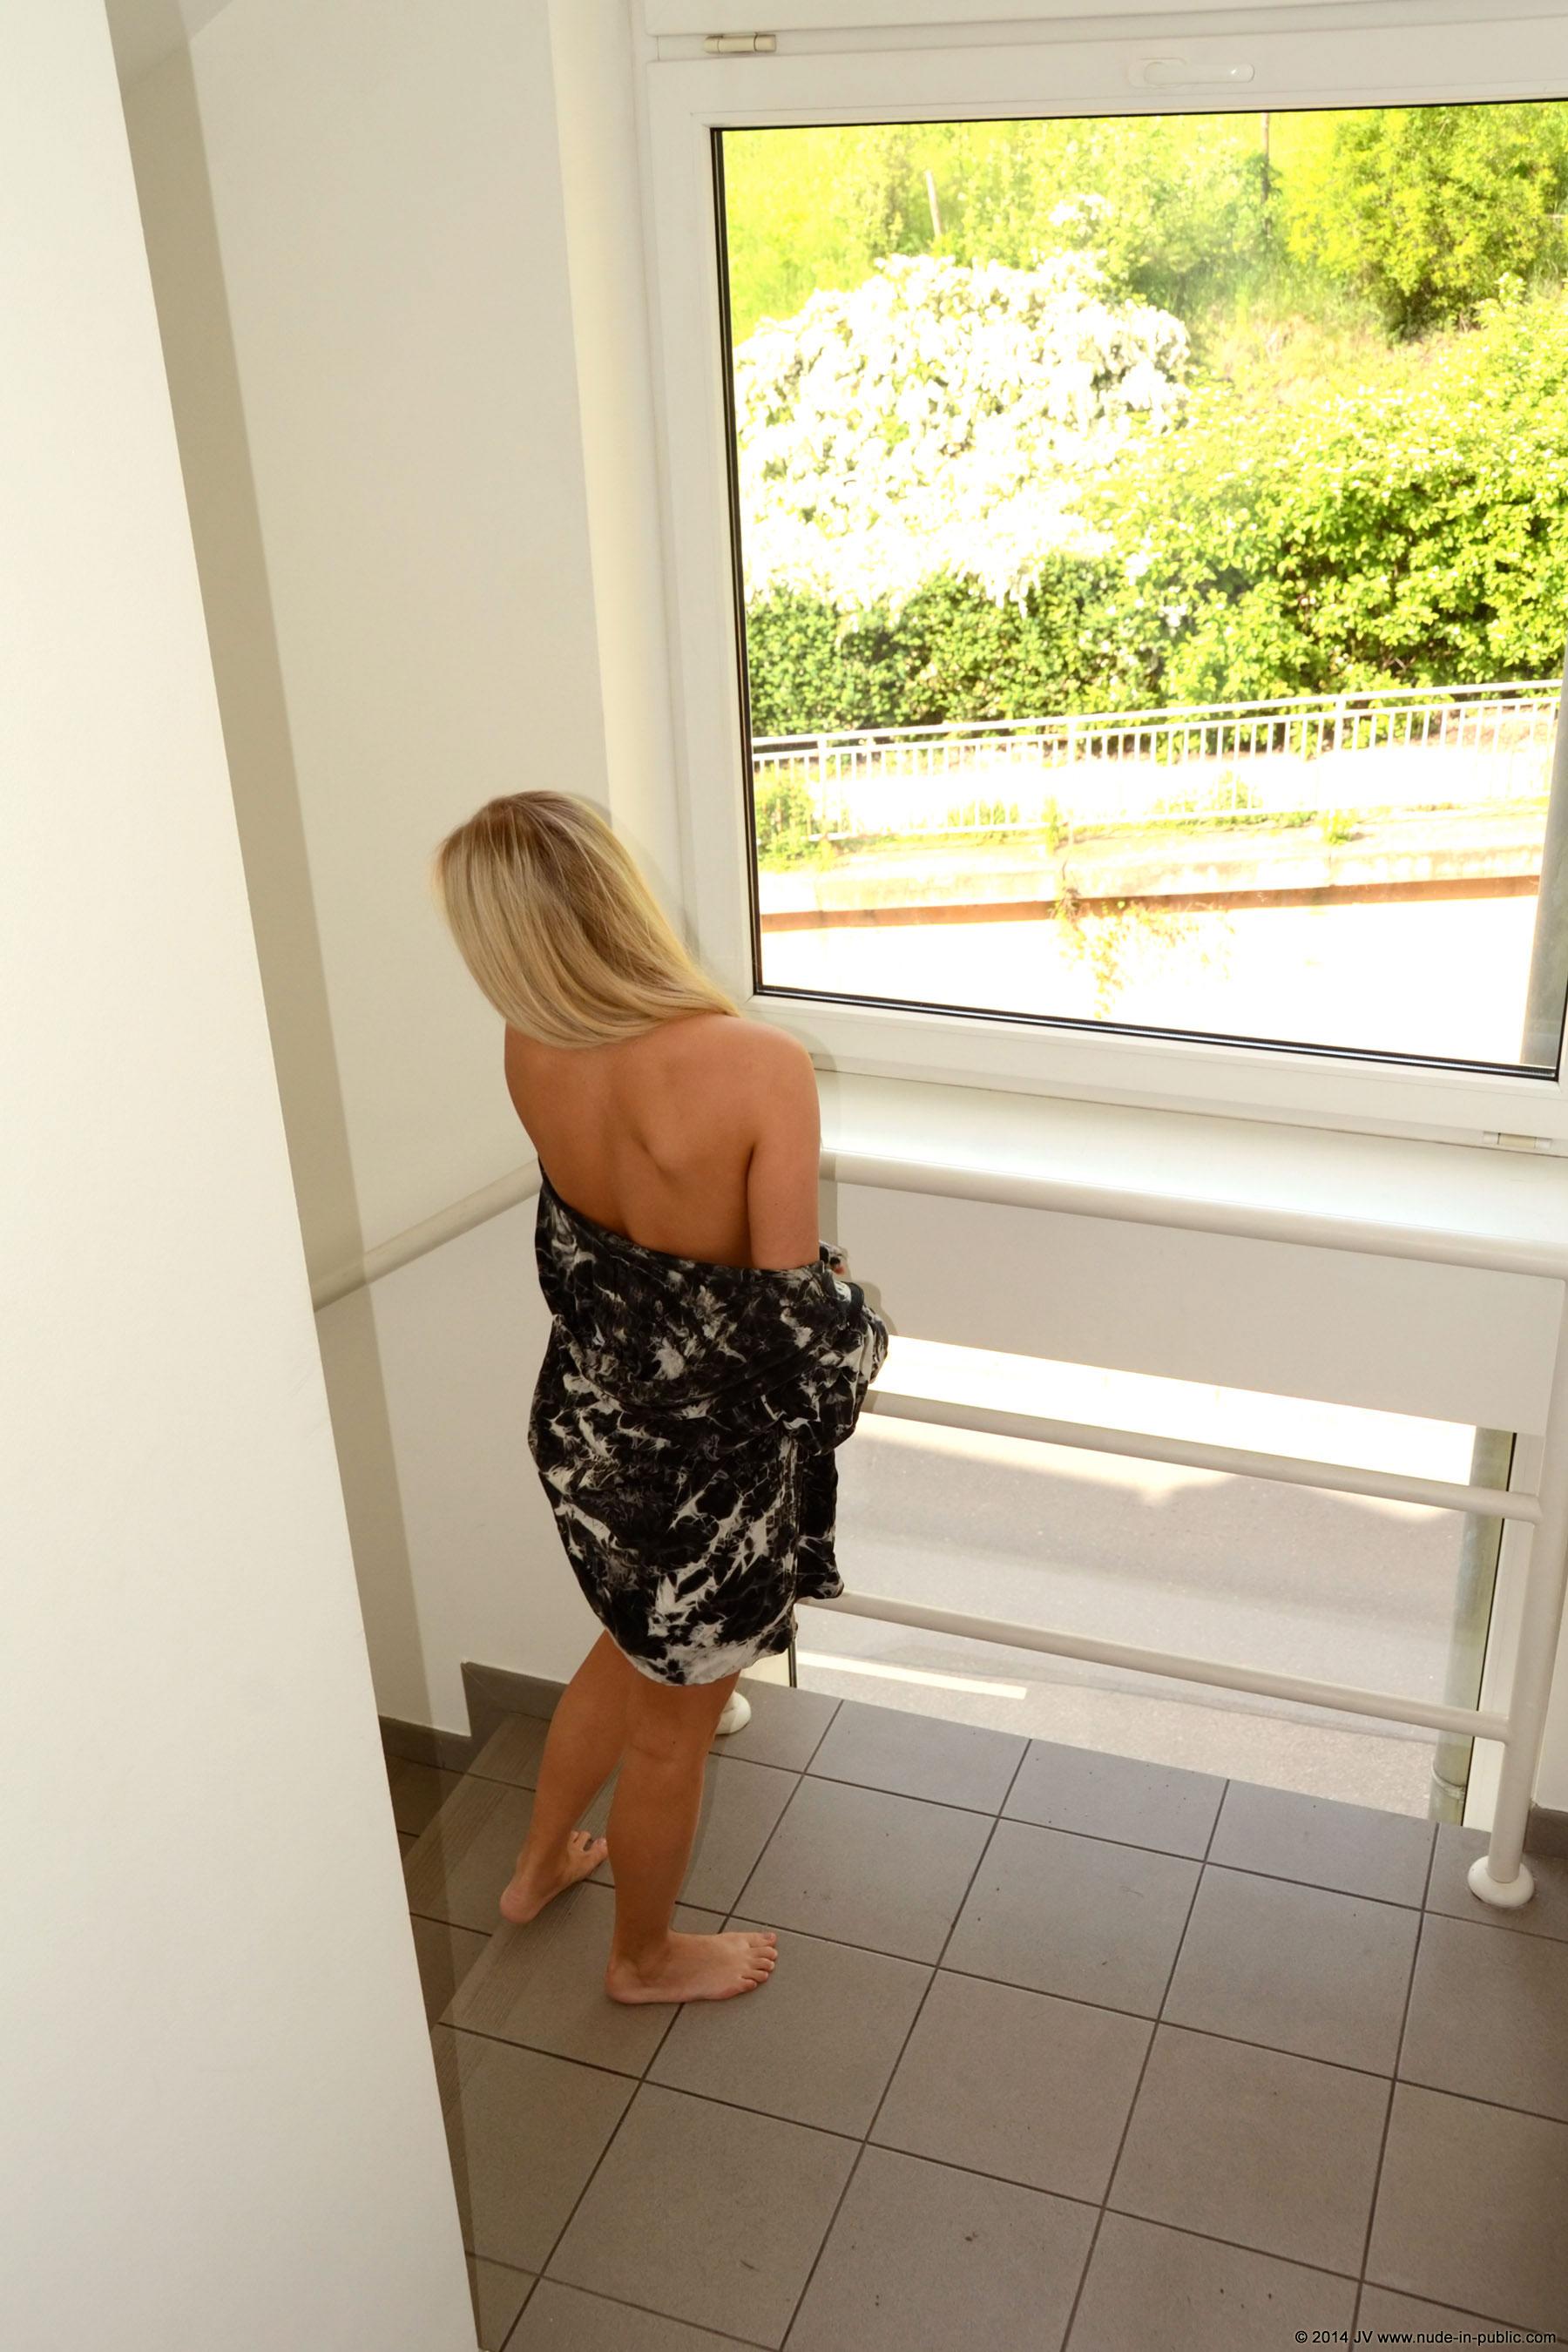 karolina-m-blonde-on-the-street-nude-in-public-03